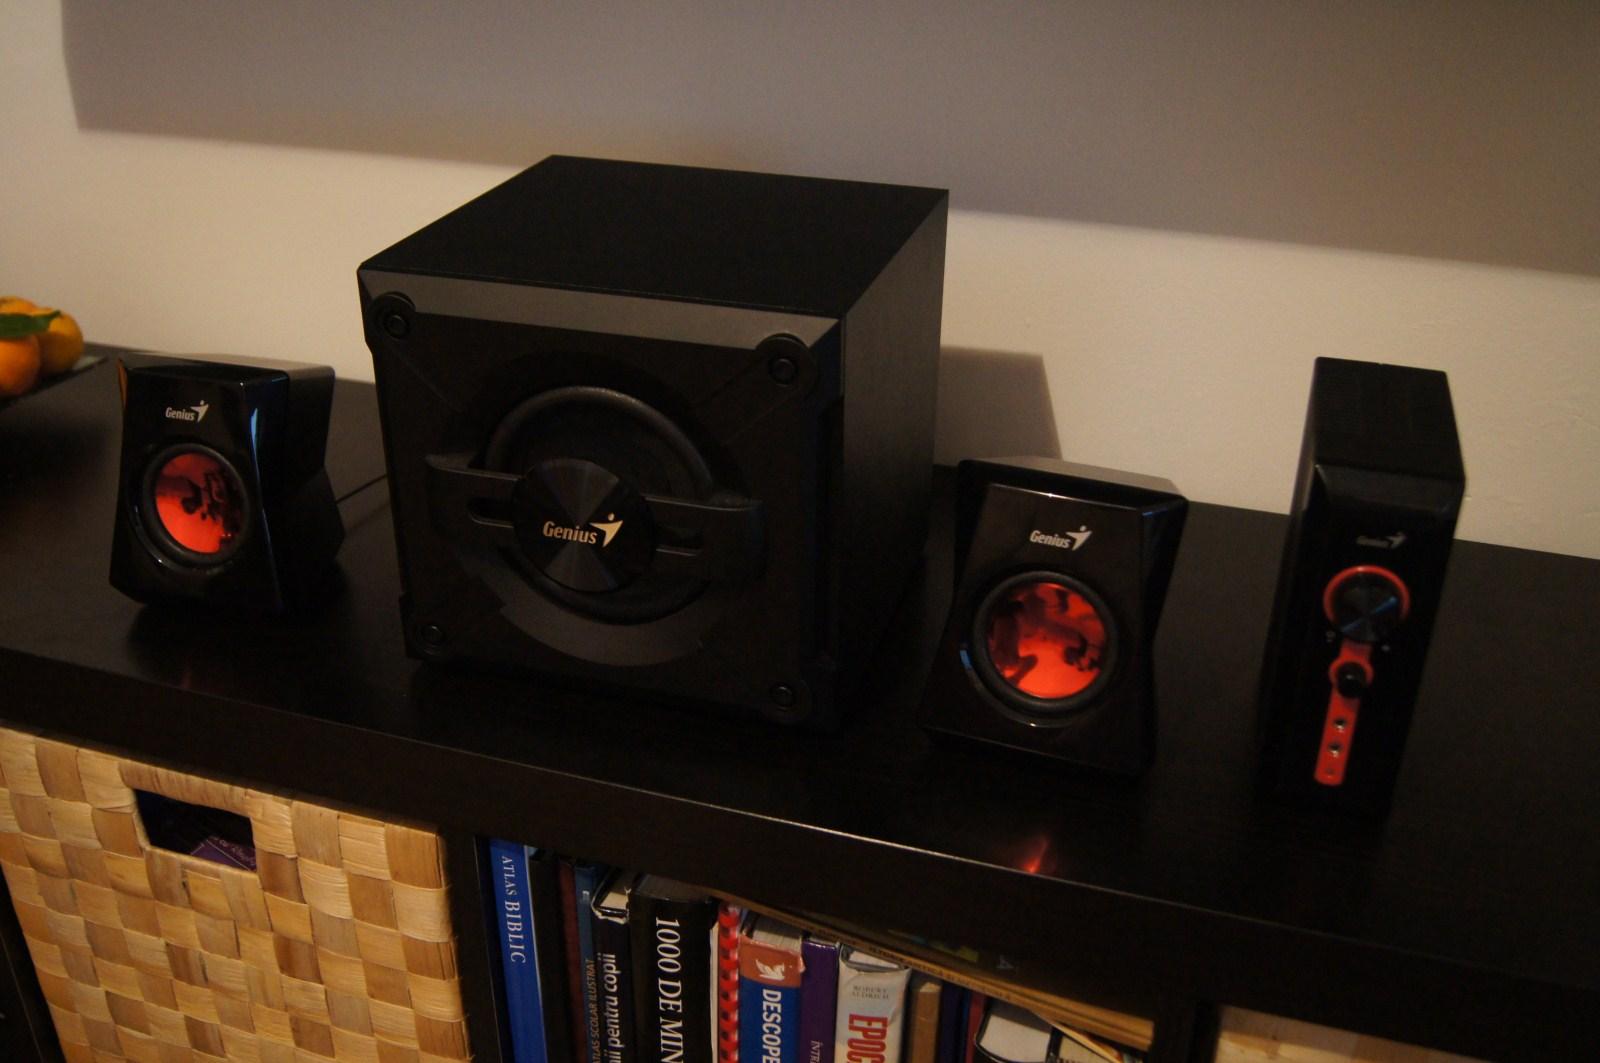 boxe genius sw g2 1 1250 review hi tech. Black Bedroom Furniture Sets. Home Design Ideas